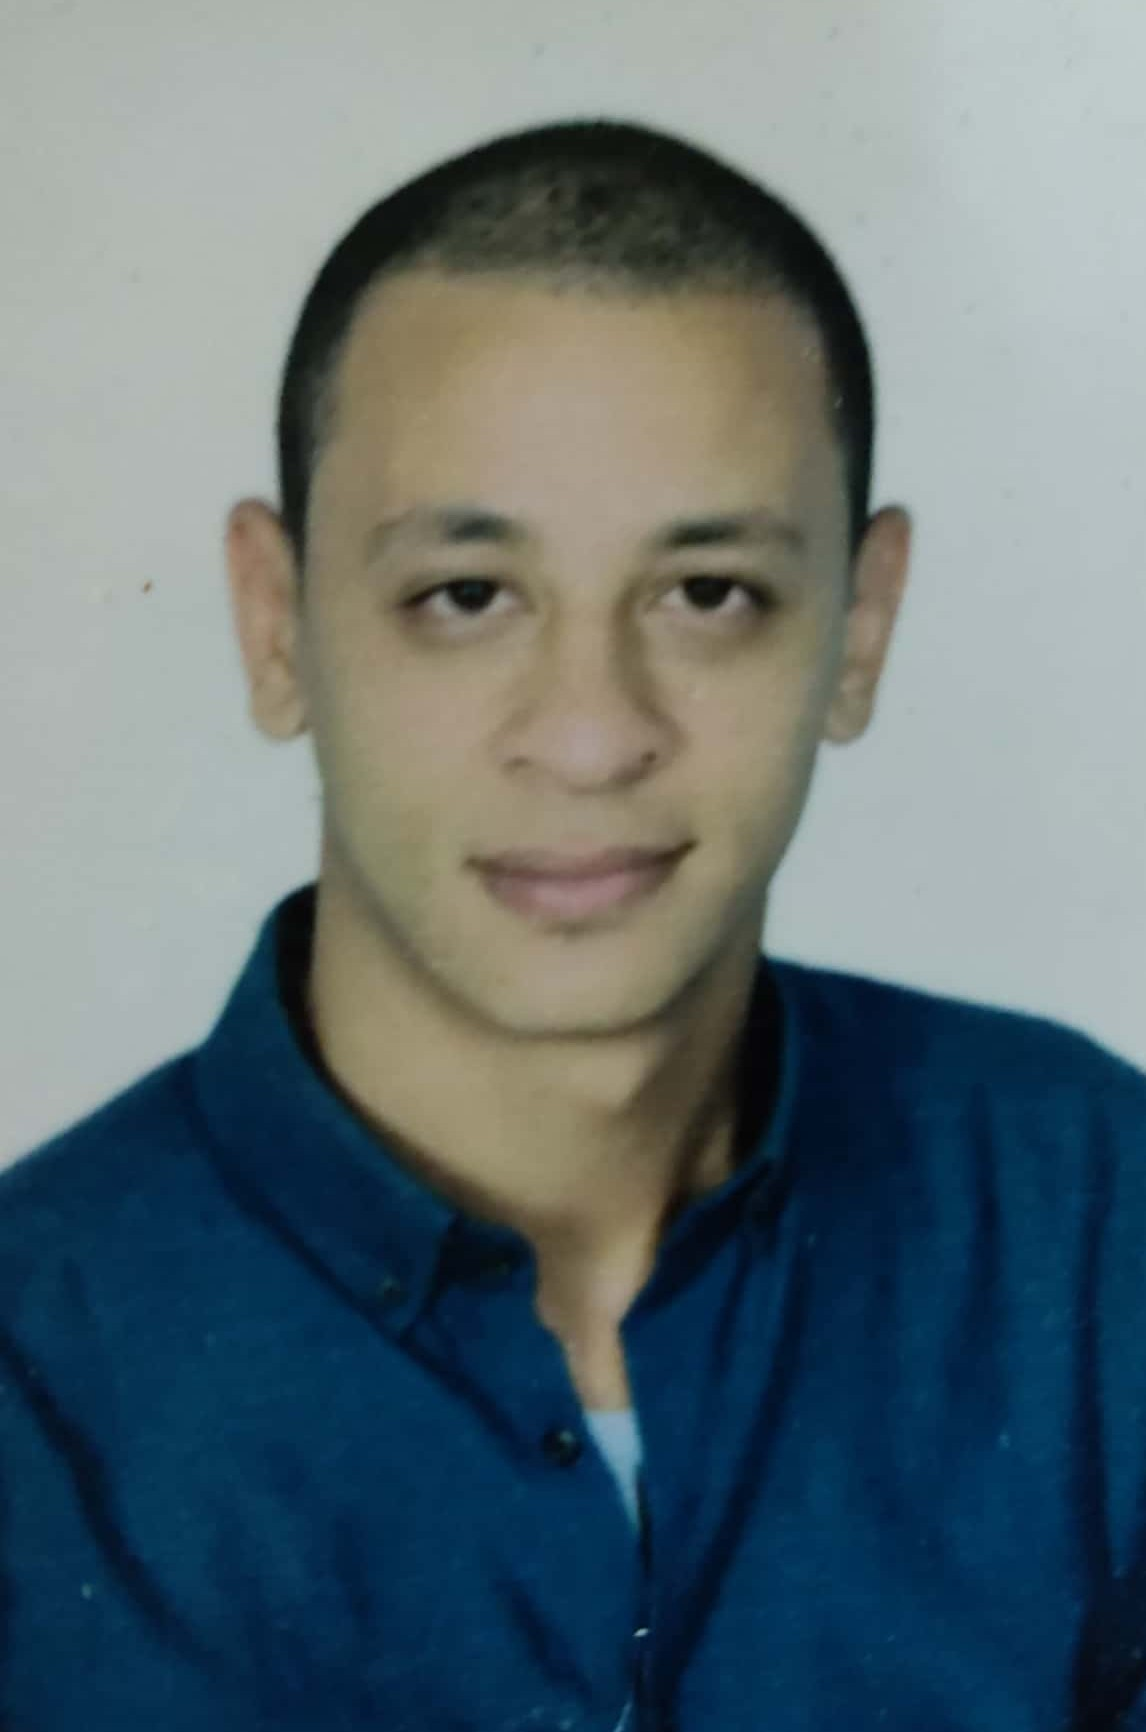 Ahmed alaa badawy seafarer Second Officer Multi-Purpose Vessel